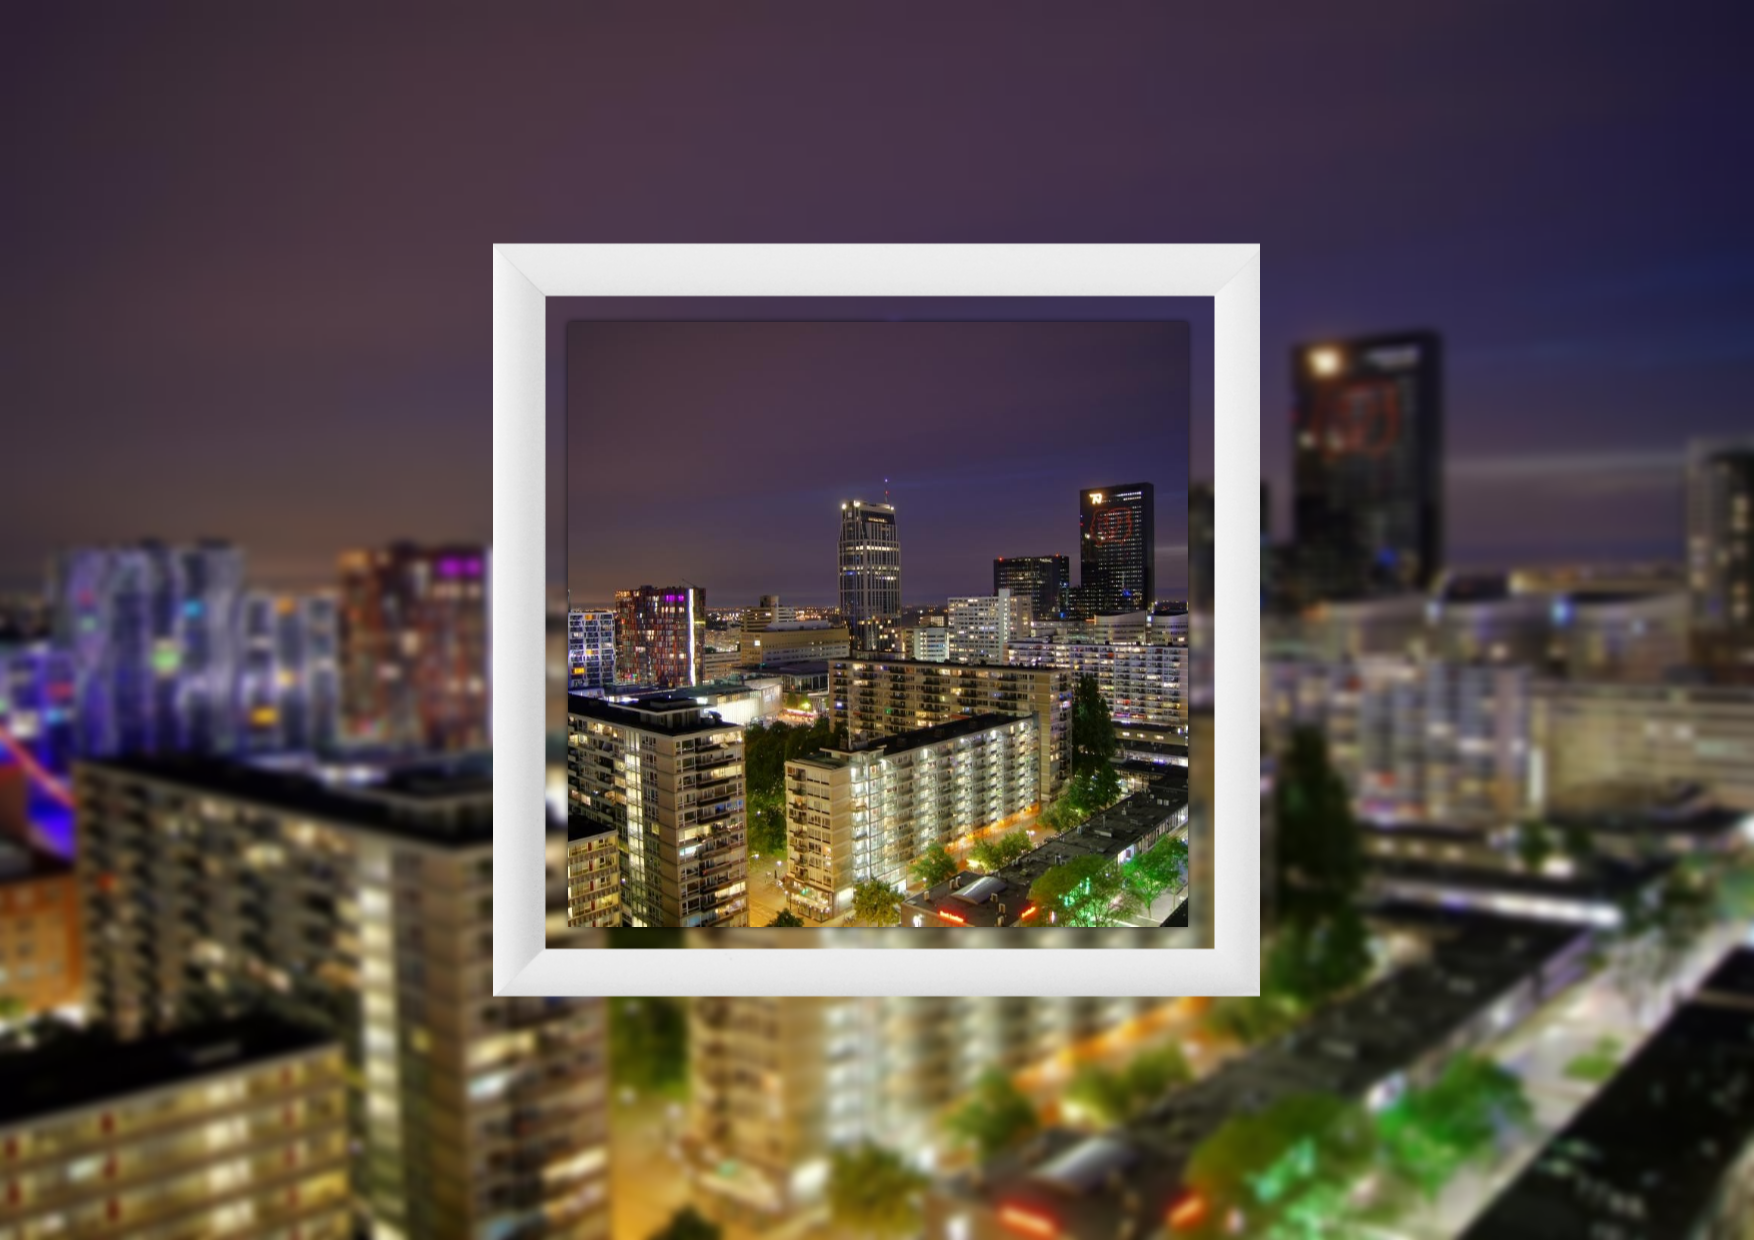 Skyline,                City,                Condominium,                Metropolis,                Cityscape,                Mockup,                Frame,                Image,                Avatar,                Black,                 Free Image